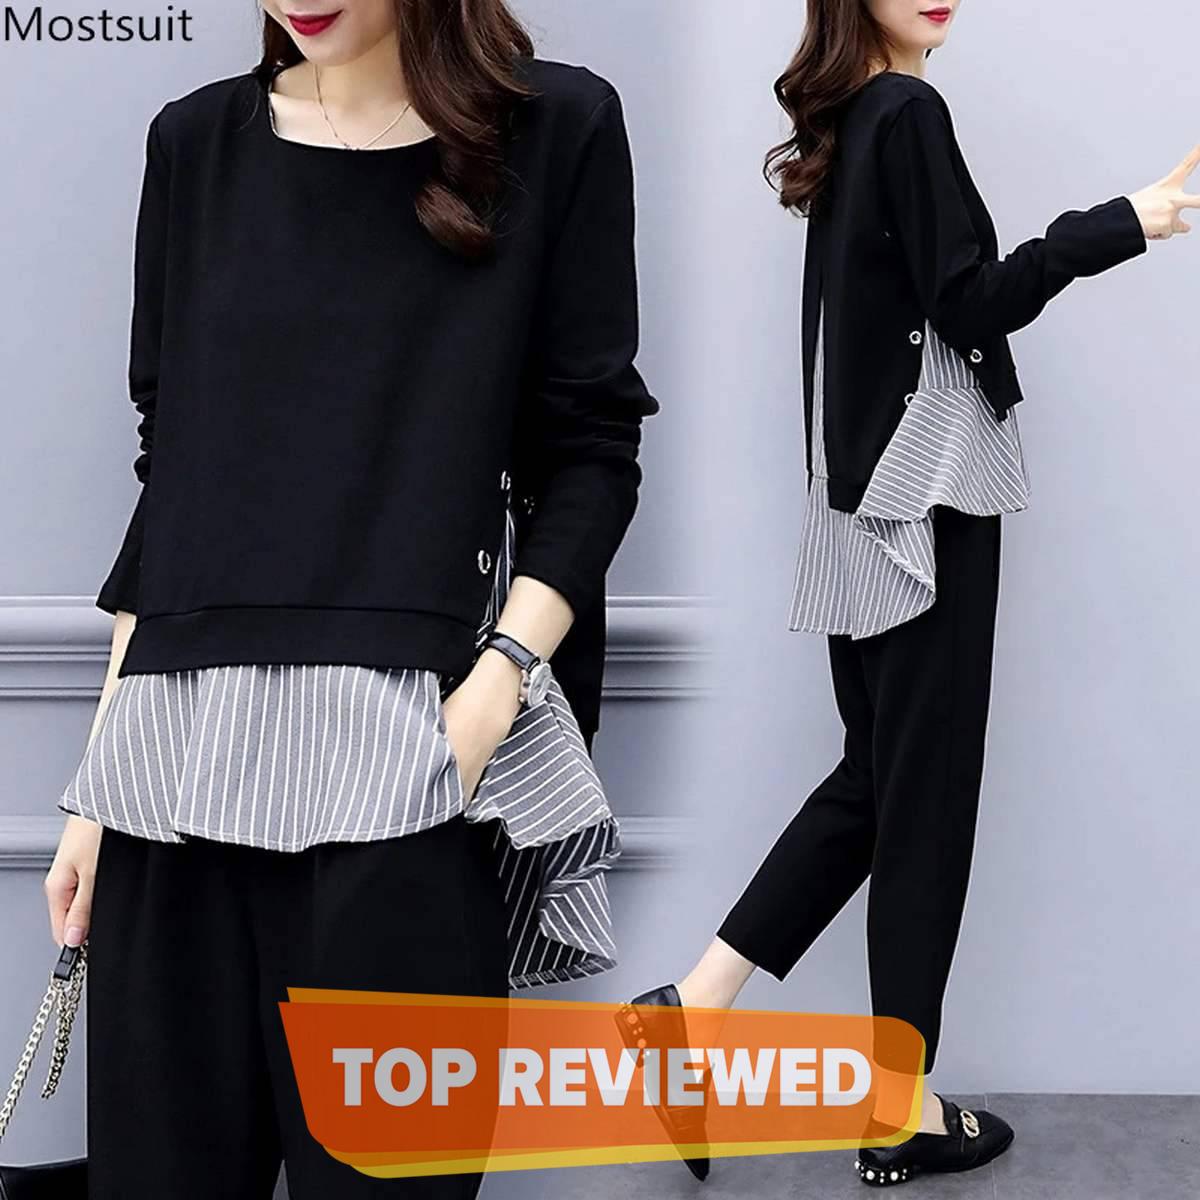 Fashionable Western Stripe Top For Women